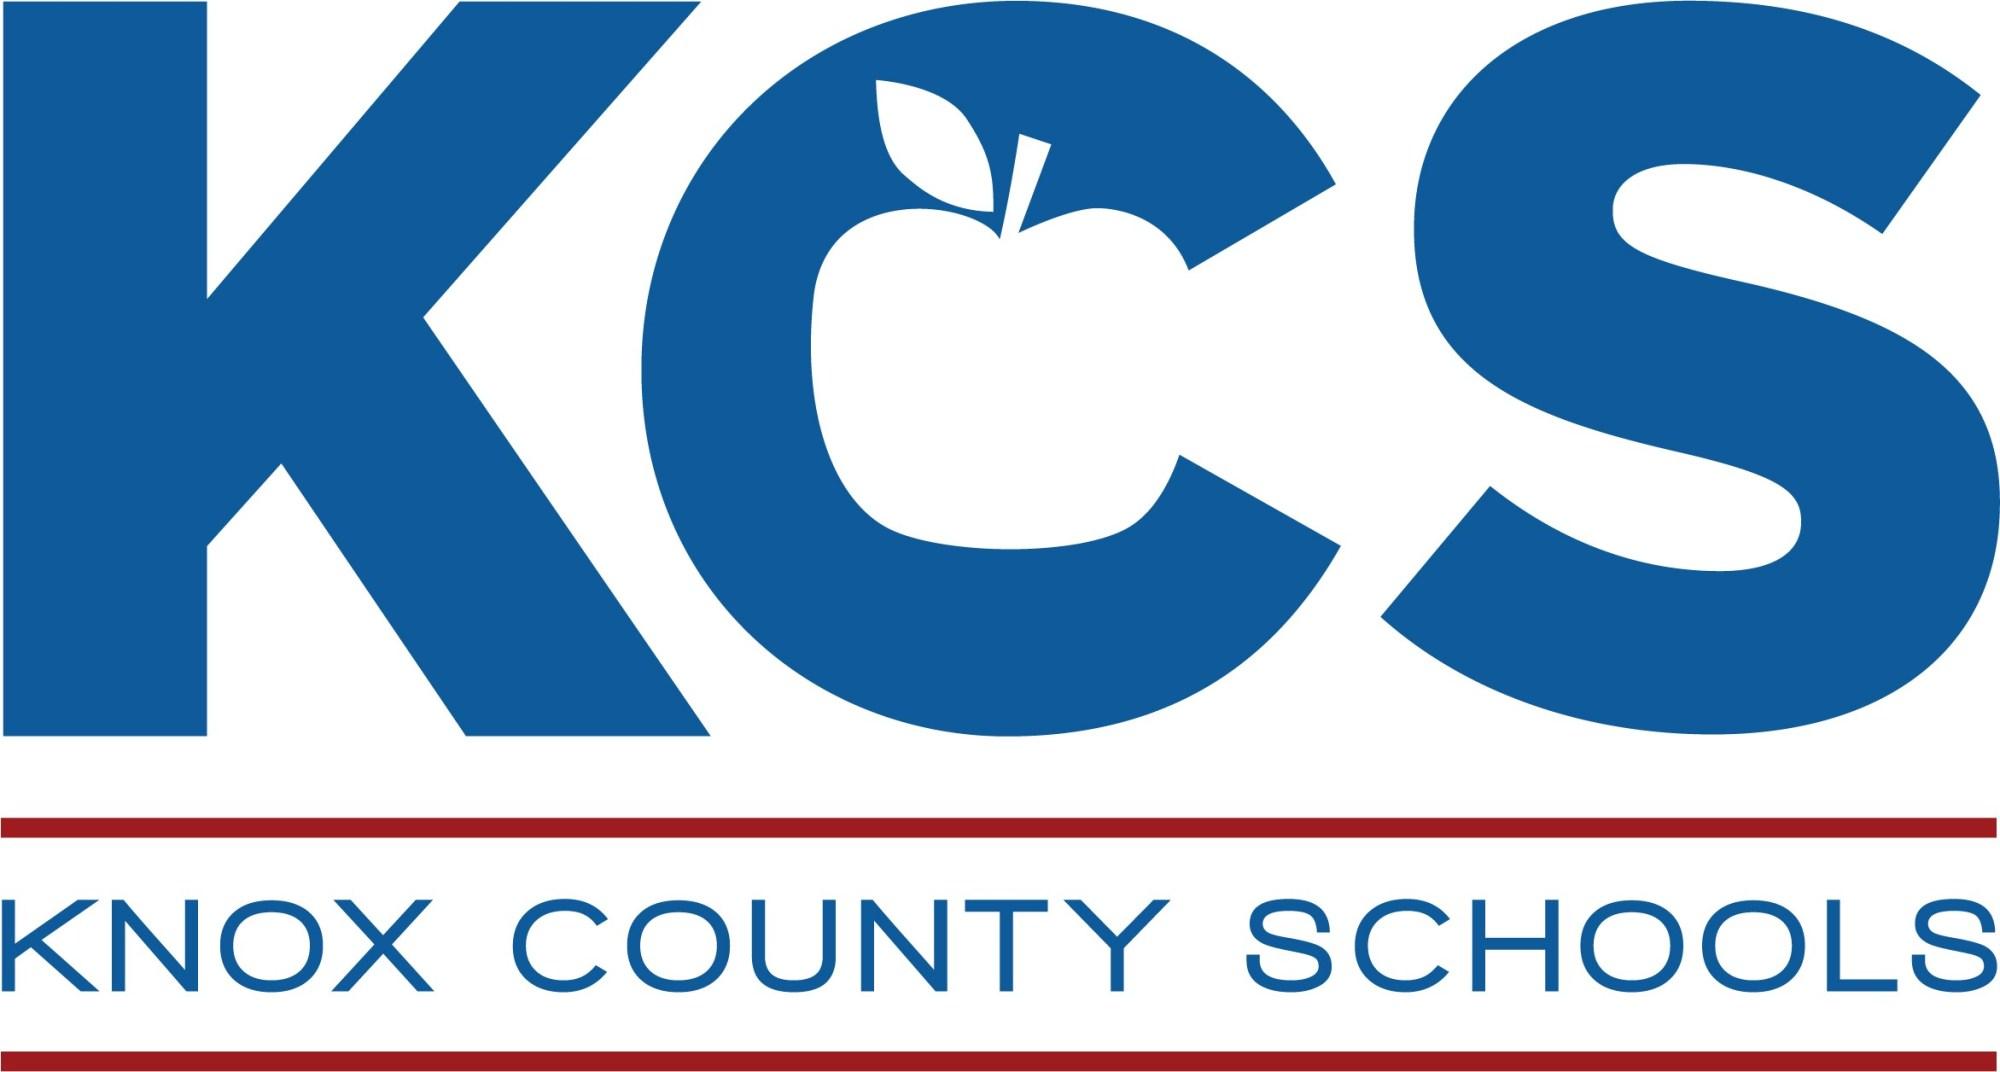 Knox County Schools KCS logo